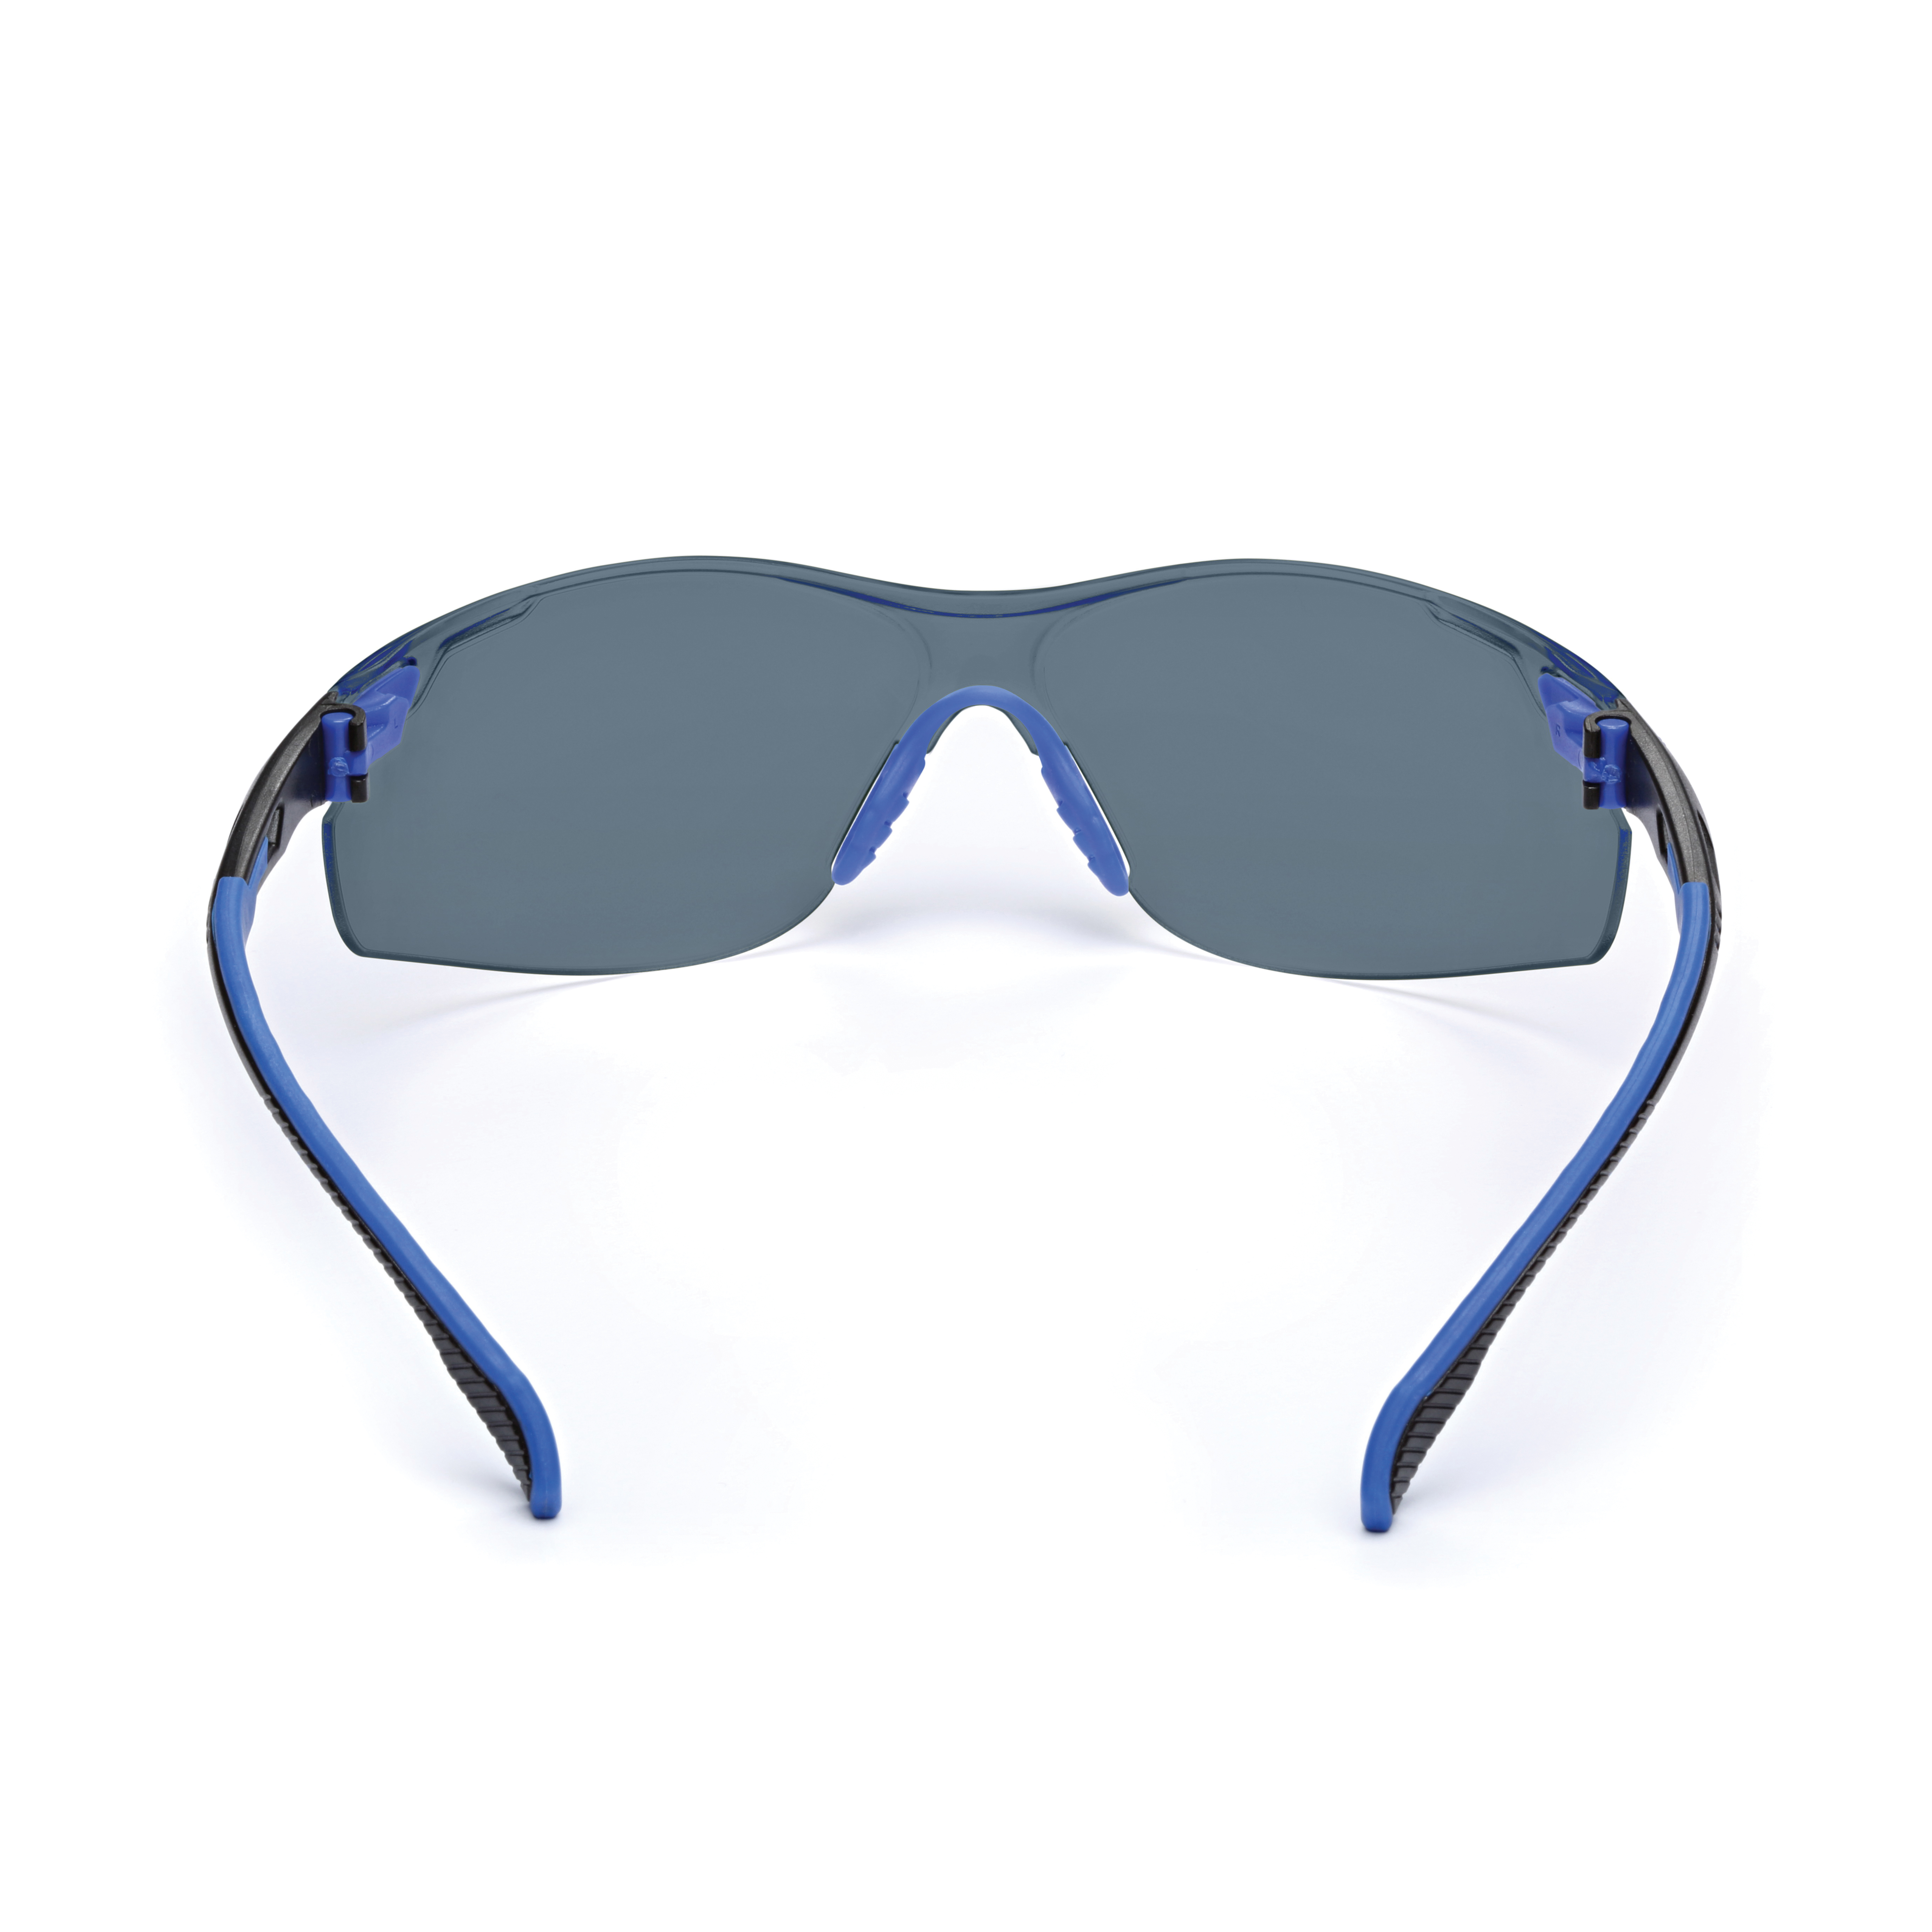 3M™ Solus™ 051131-27187 S1102SGAF 1000 Premium Safety Glasses, Scotchgard™ Anti-Fog Gray Lens, Half Framed Blue/Black Polycarbonate Frame, Polycarbonate Lens, Specifications Met: ANSI Z87.1-2015, CSA Z94.4